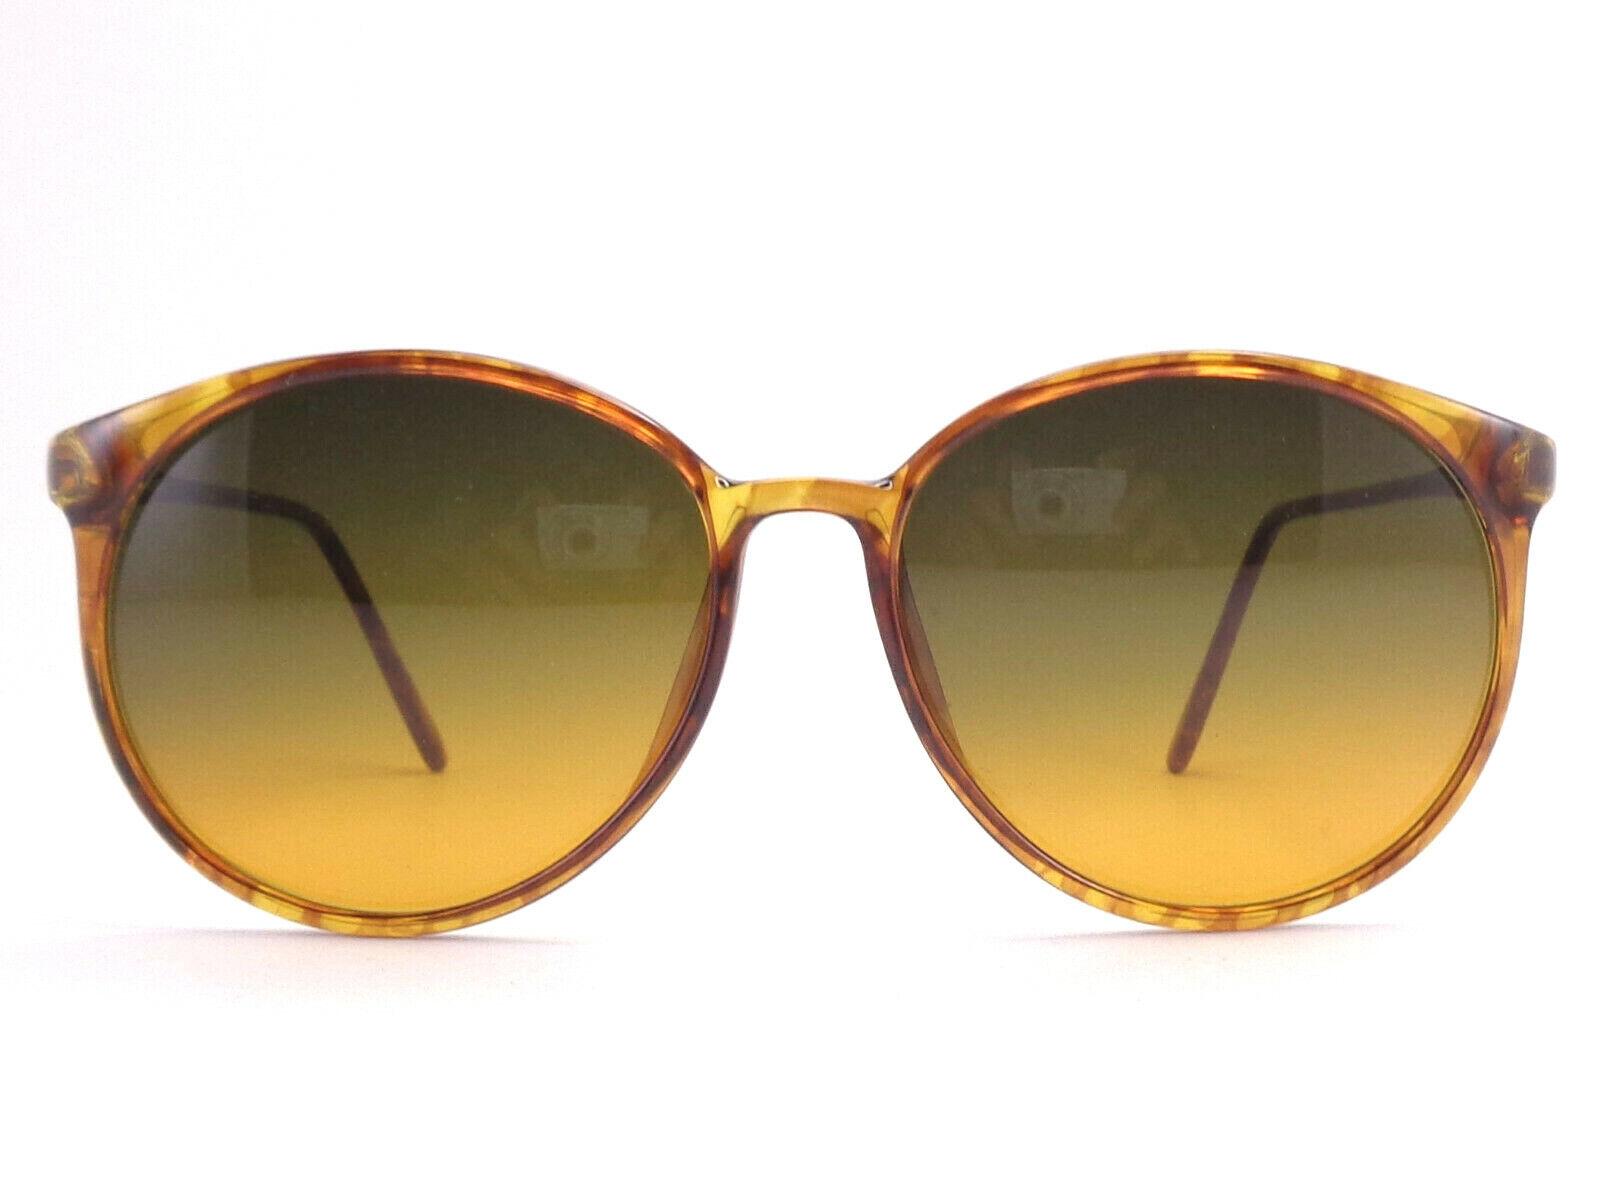 Glasses alone Carrera Vintage Woman Model 5354 Brown Tortoiseshell-show original title